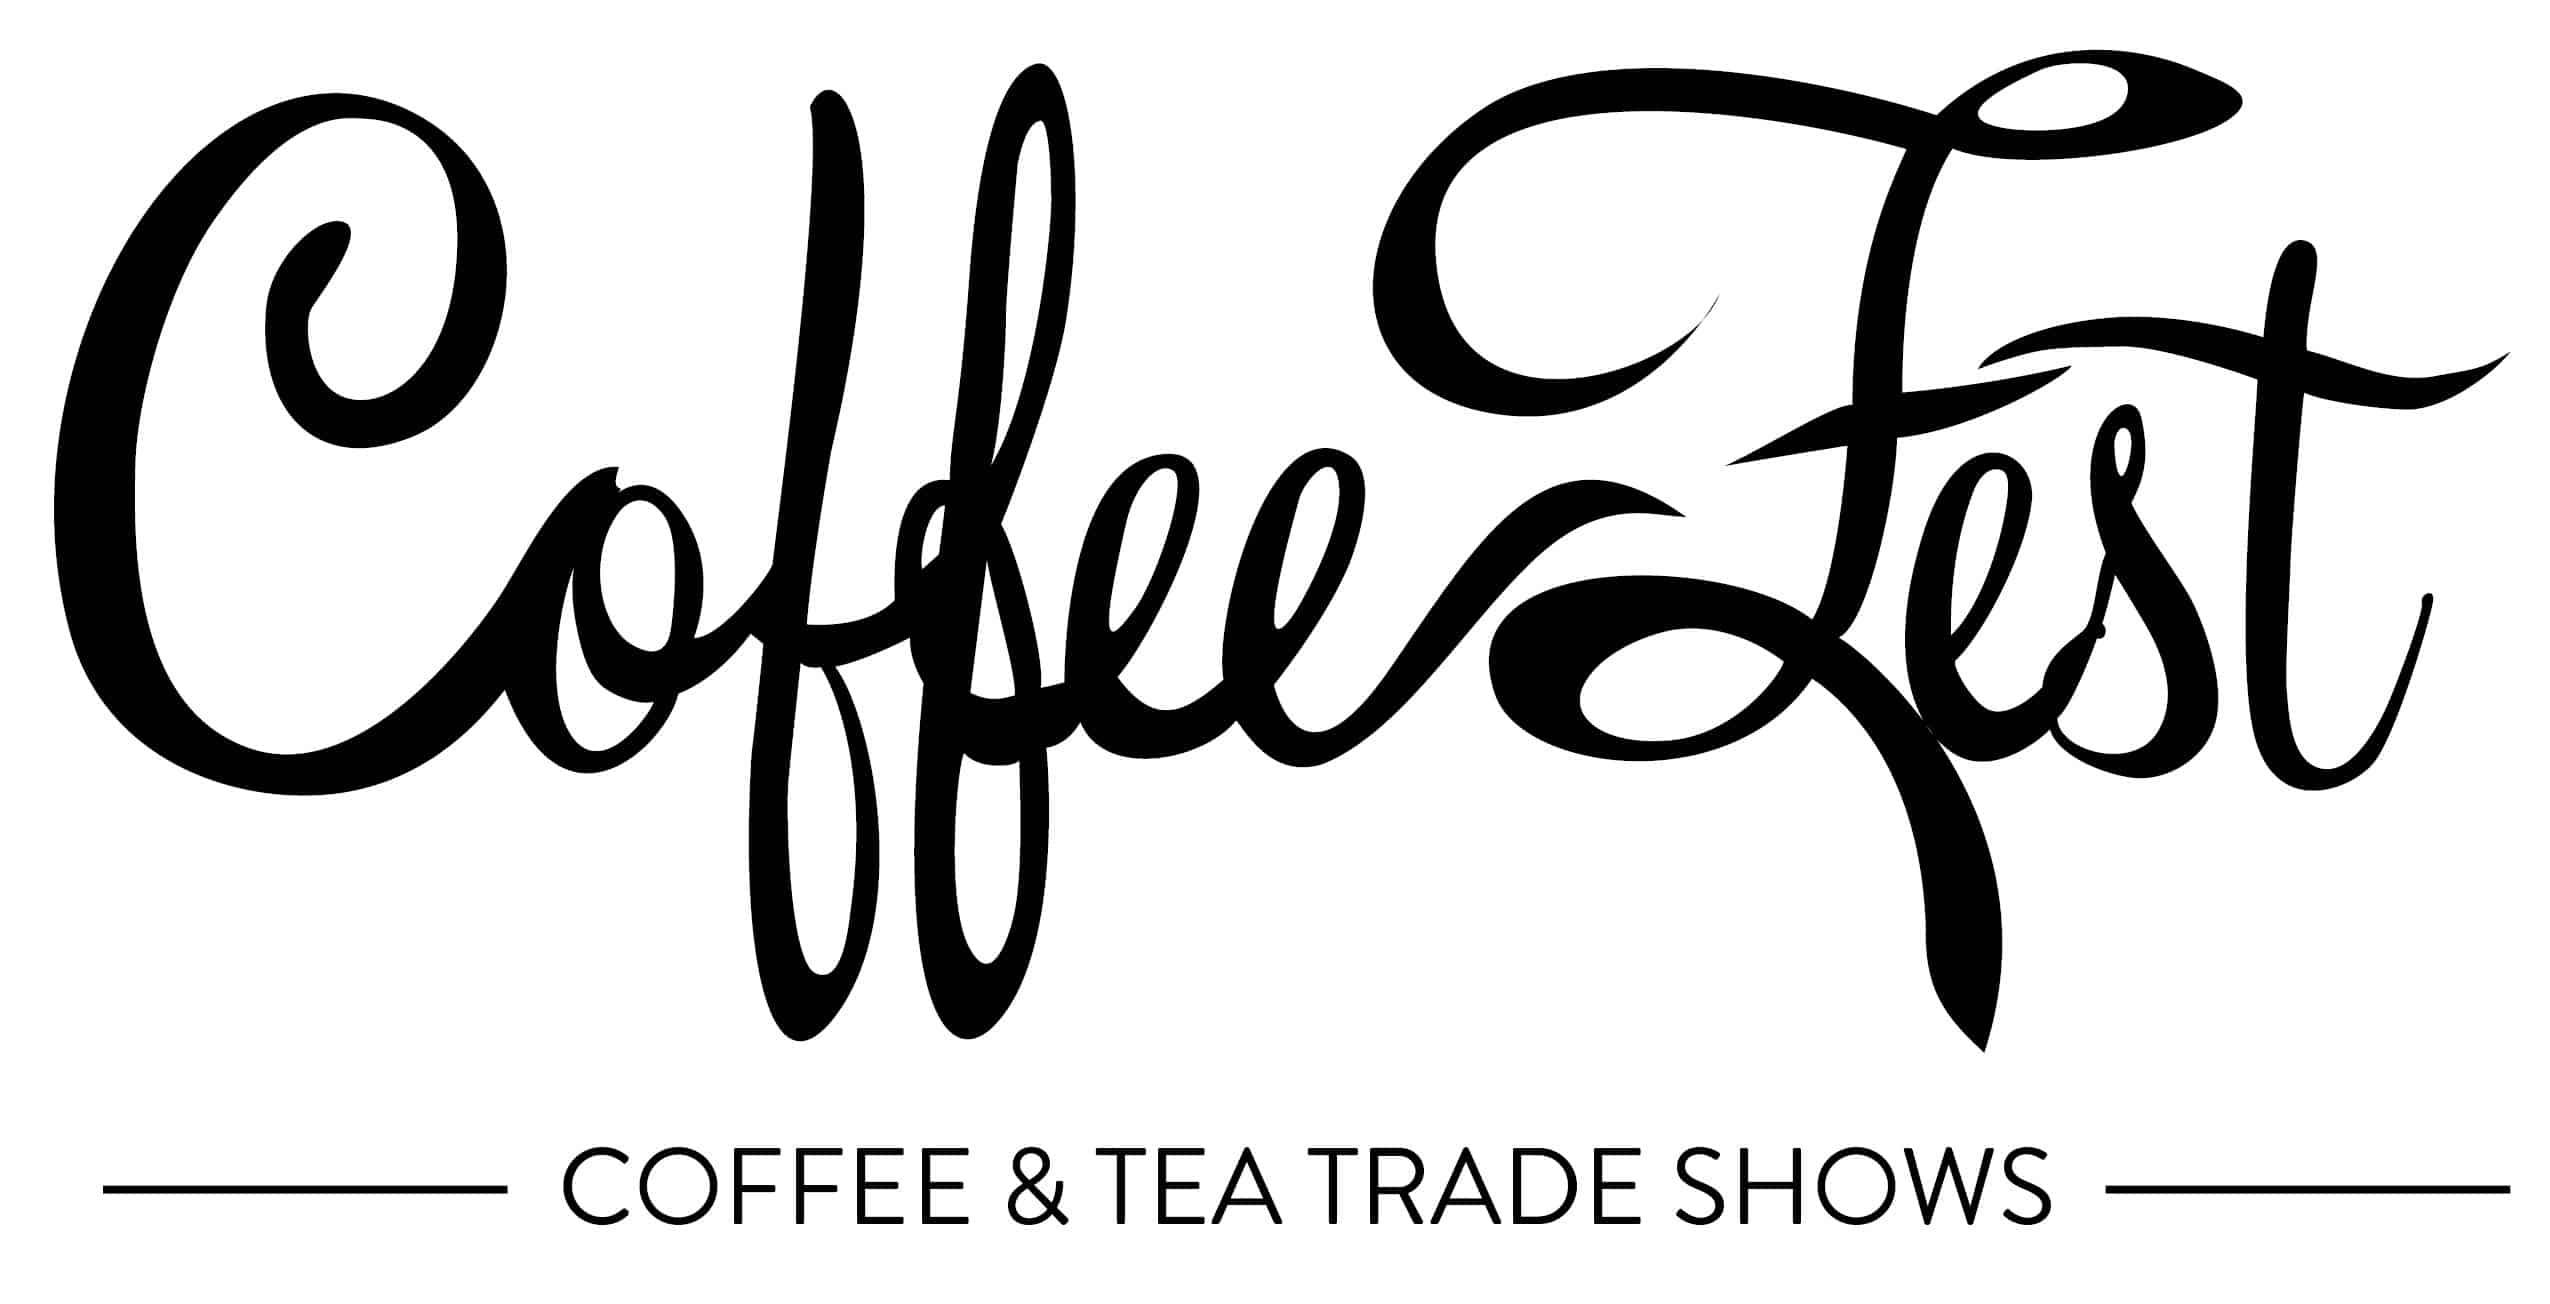 Coffee Fest Trade Show - Los Angeles 2018